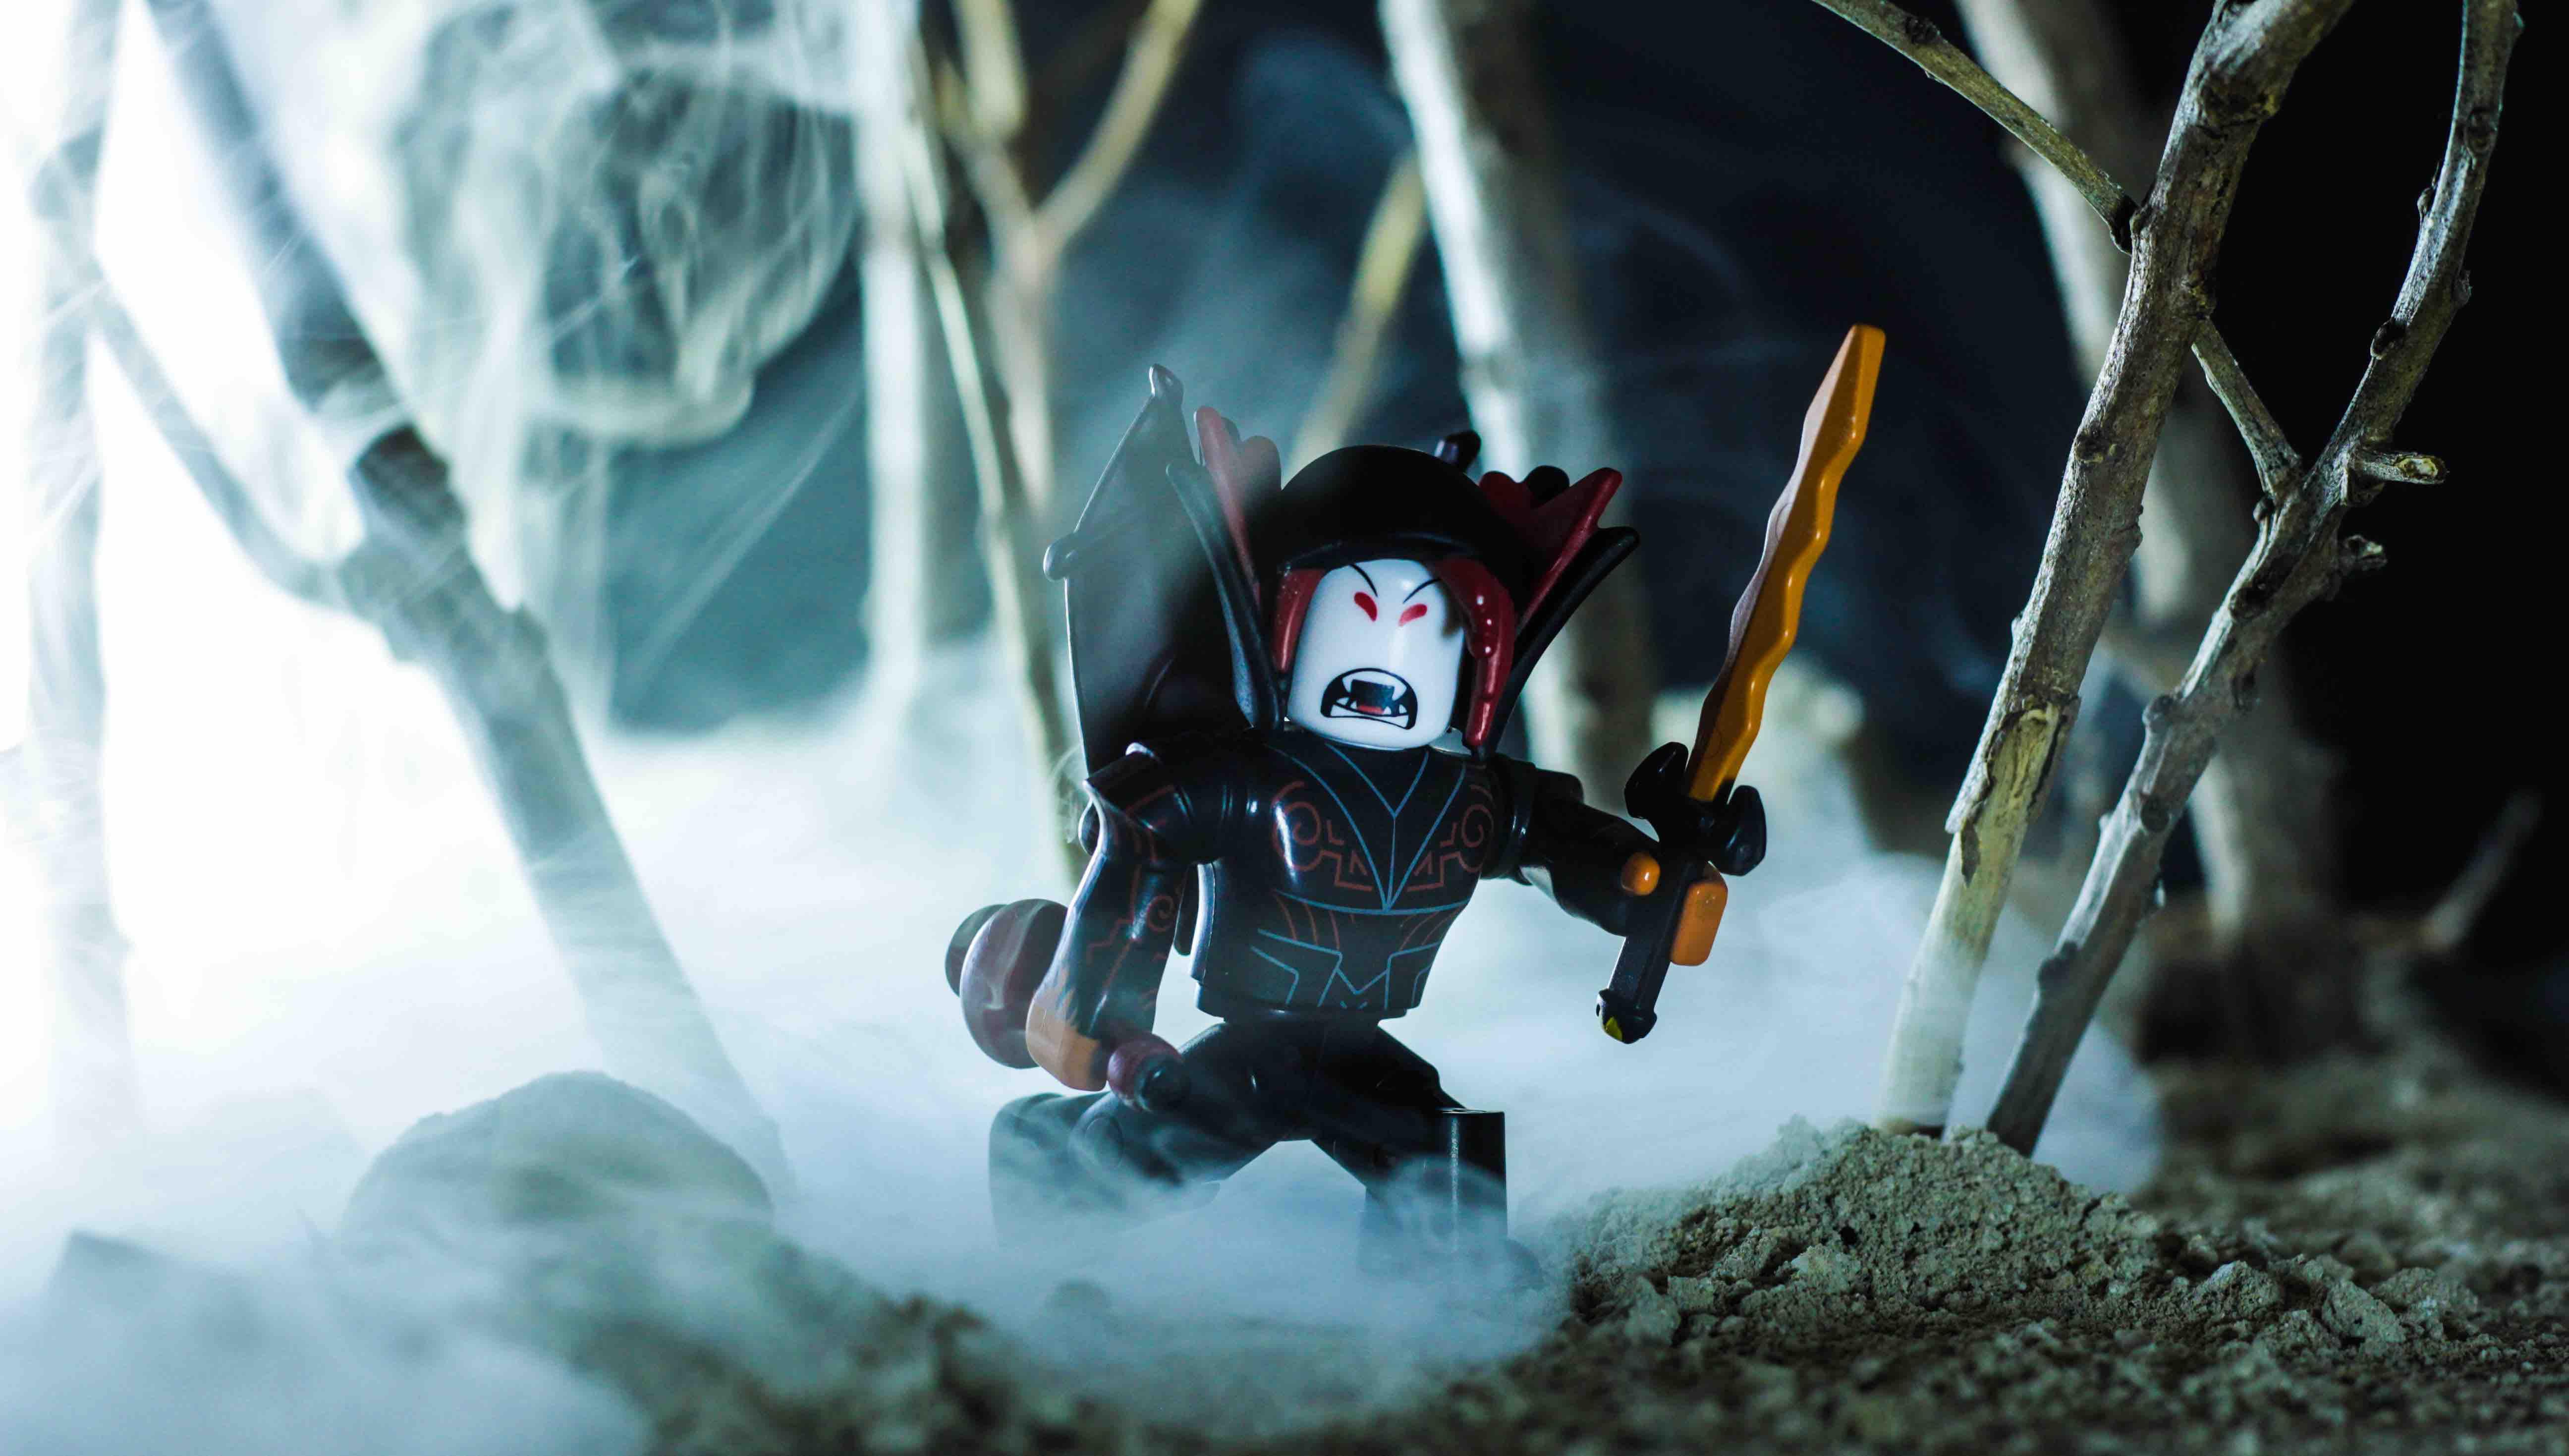 amazoncom roblox hunted vampire action figure comes Hunted Vampire